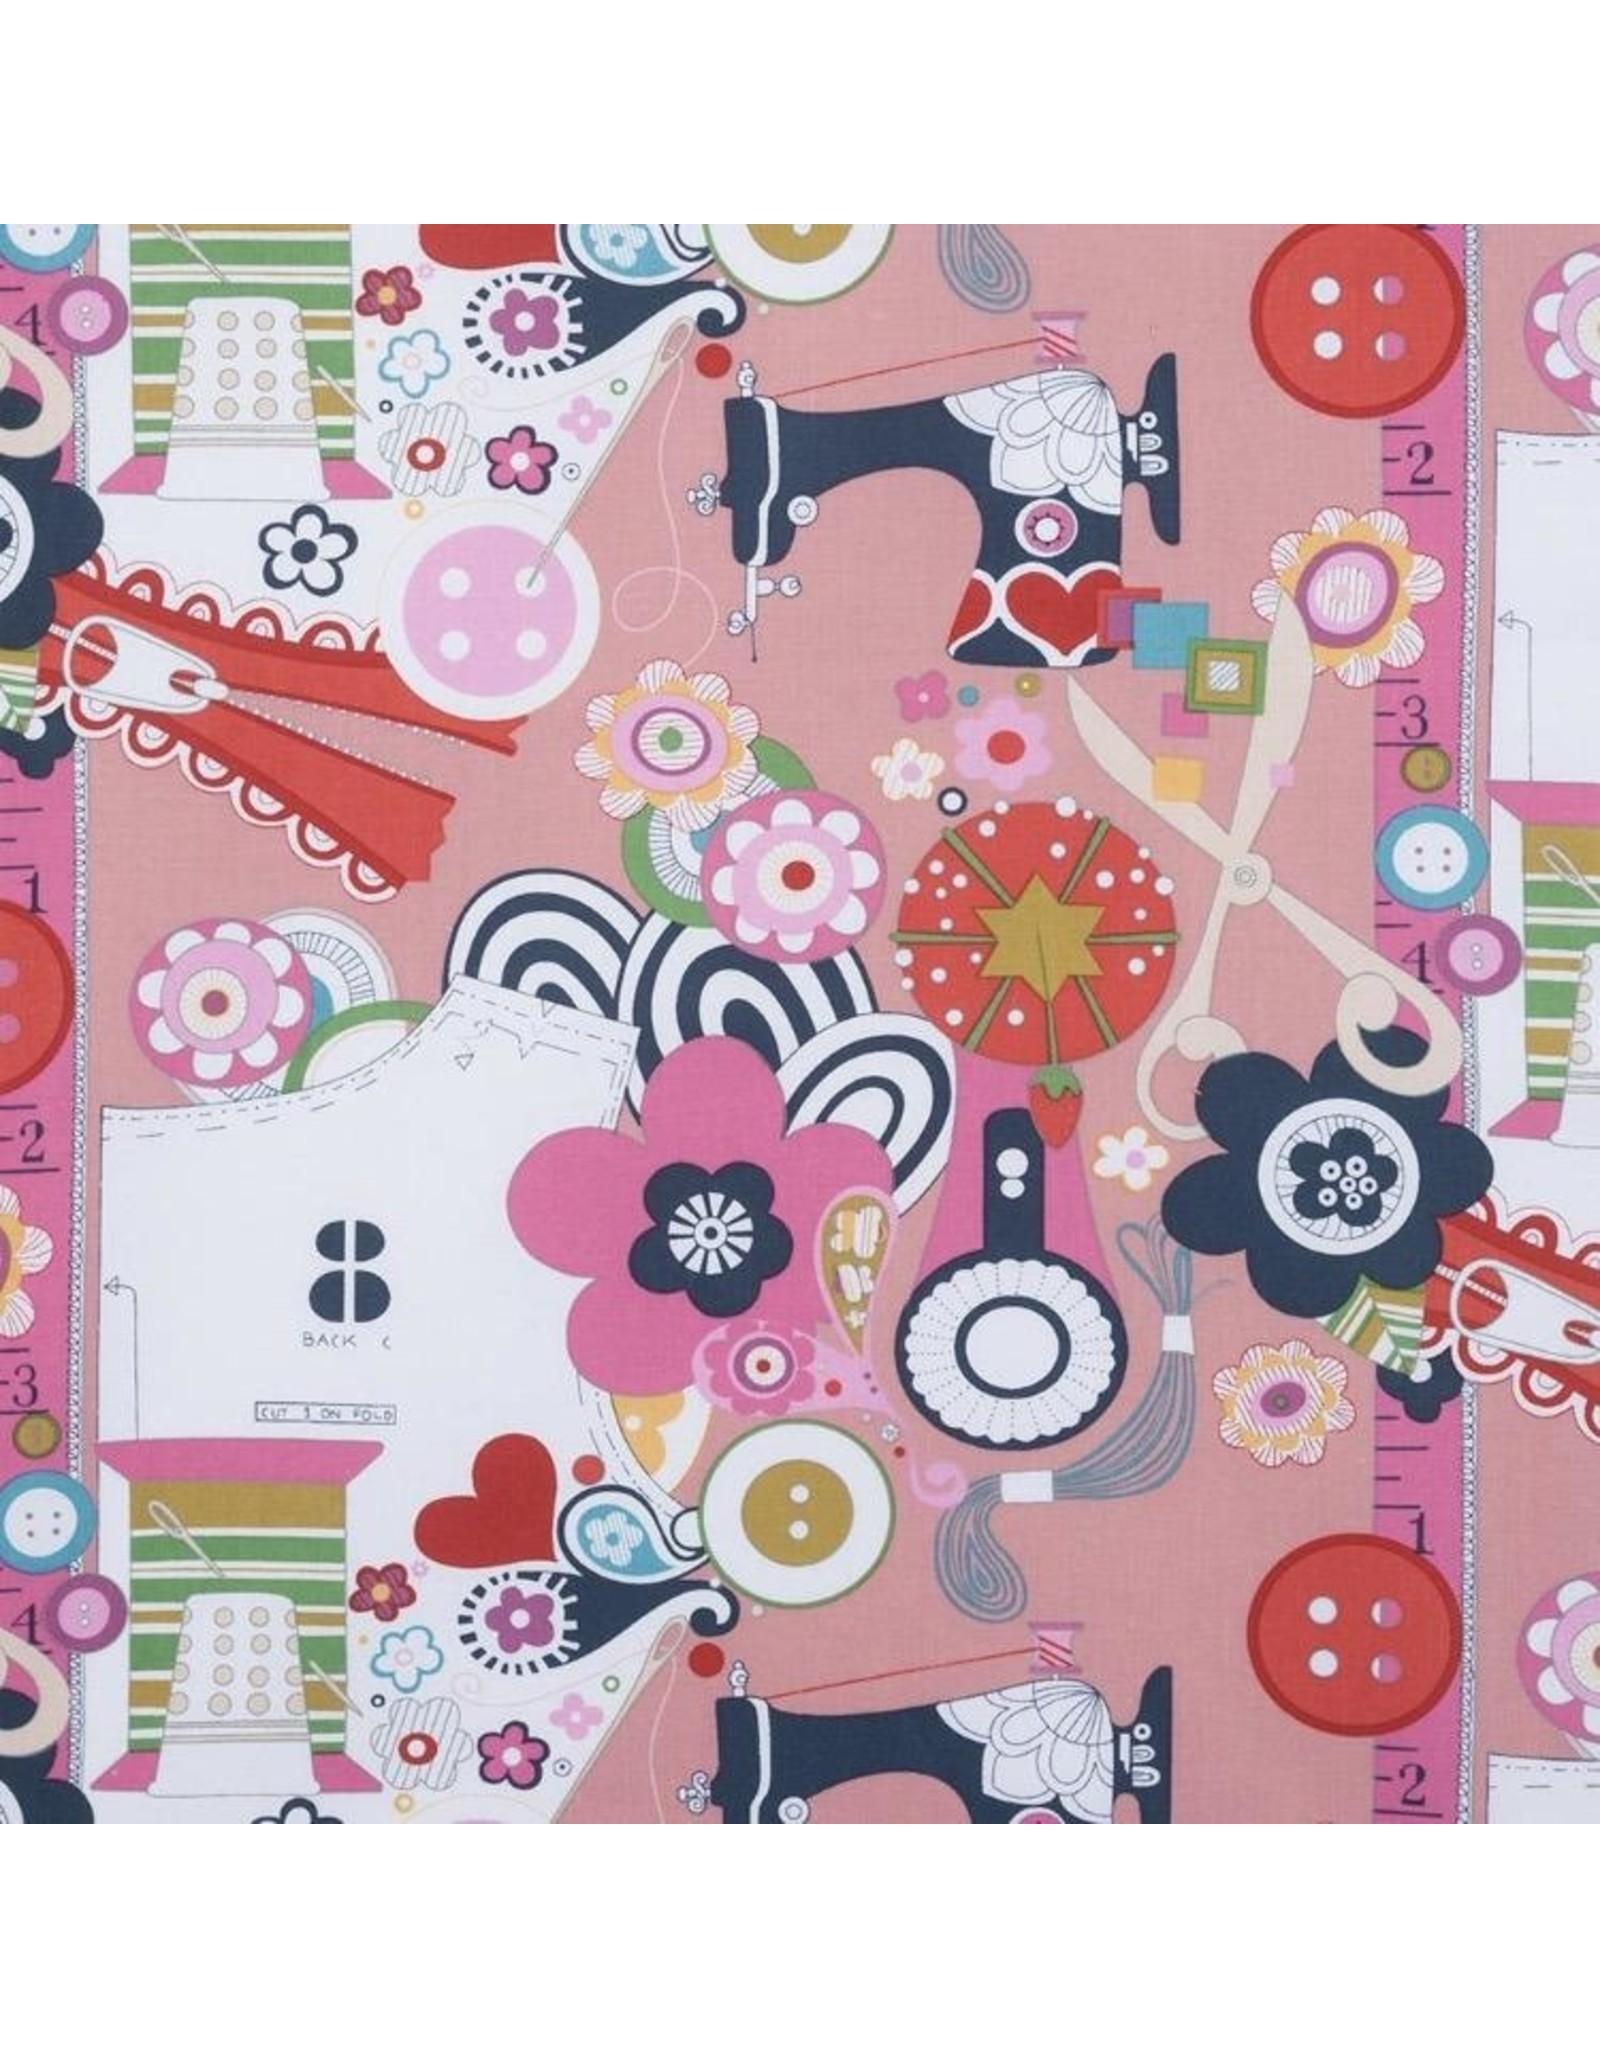 Alexander Henry Fabrics Nicole's Prints, Sew Now! Sew Wow! in Pink, Fabric Half-Yards 6880D